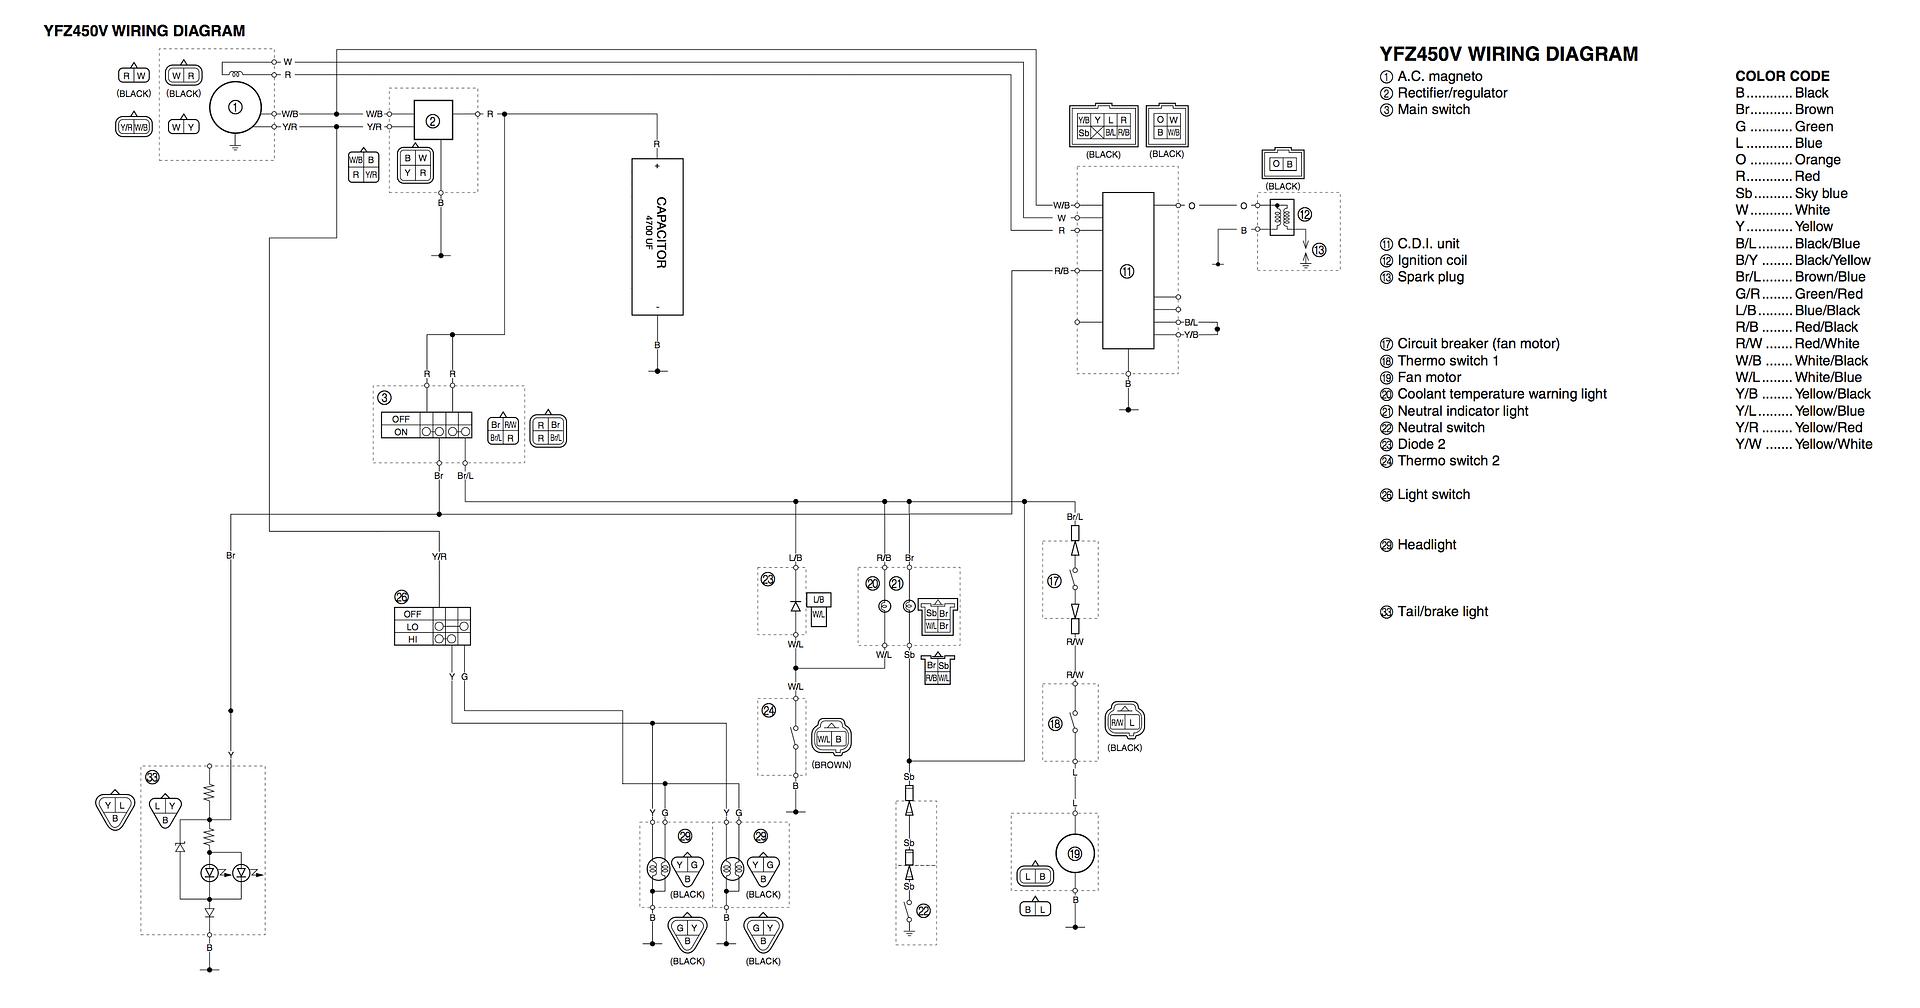 2007 Yfz 450 Headlight Wiring Diagram